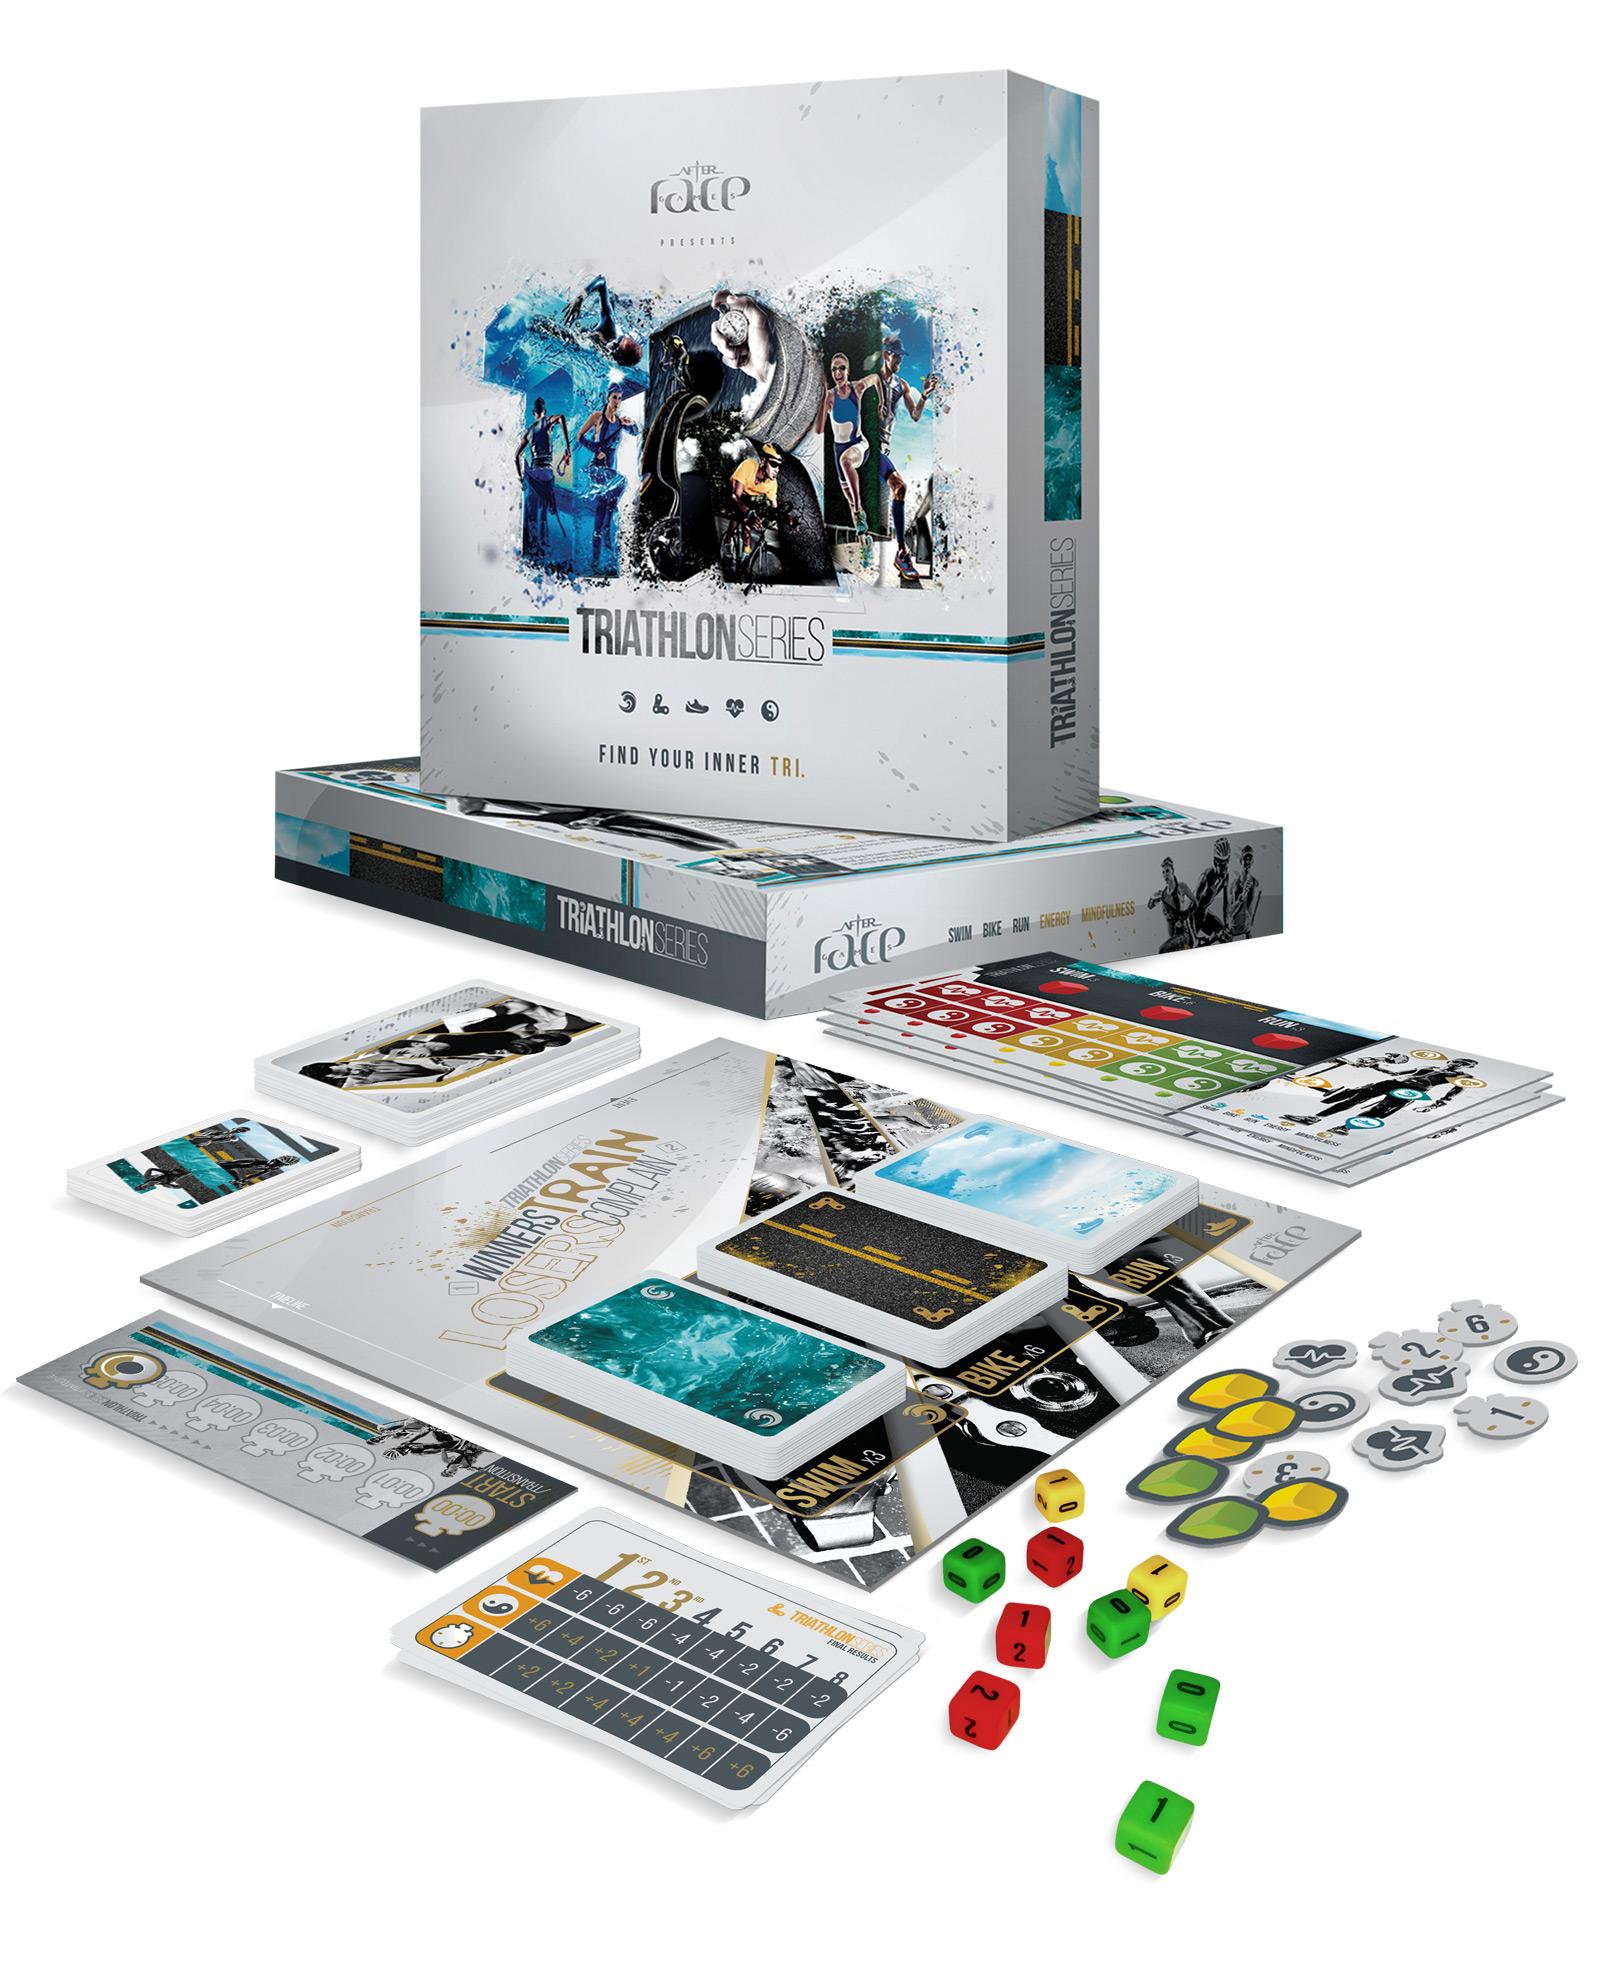 TRIATHLON Series. The Board Game